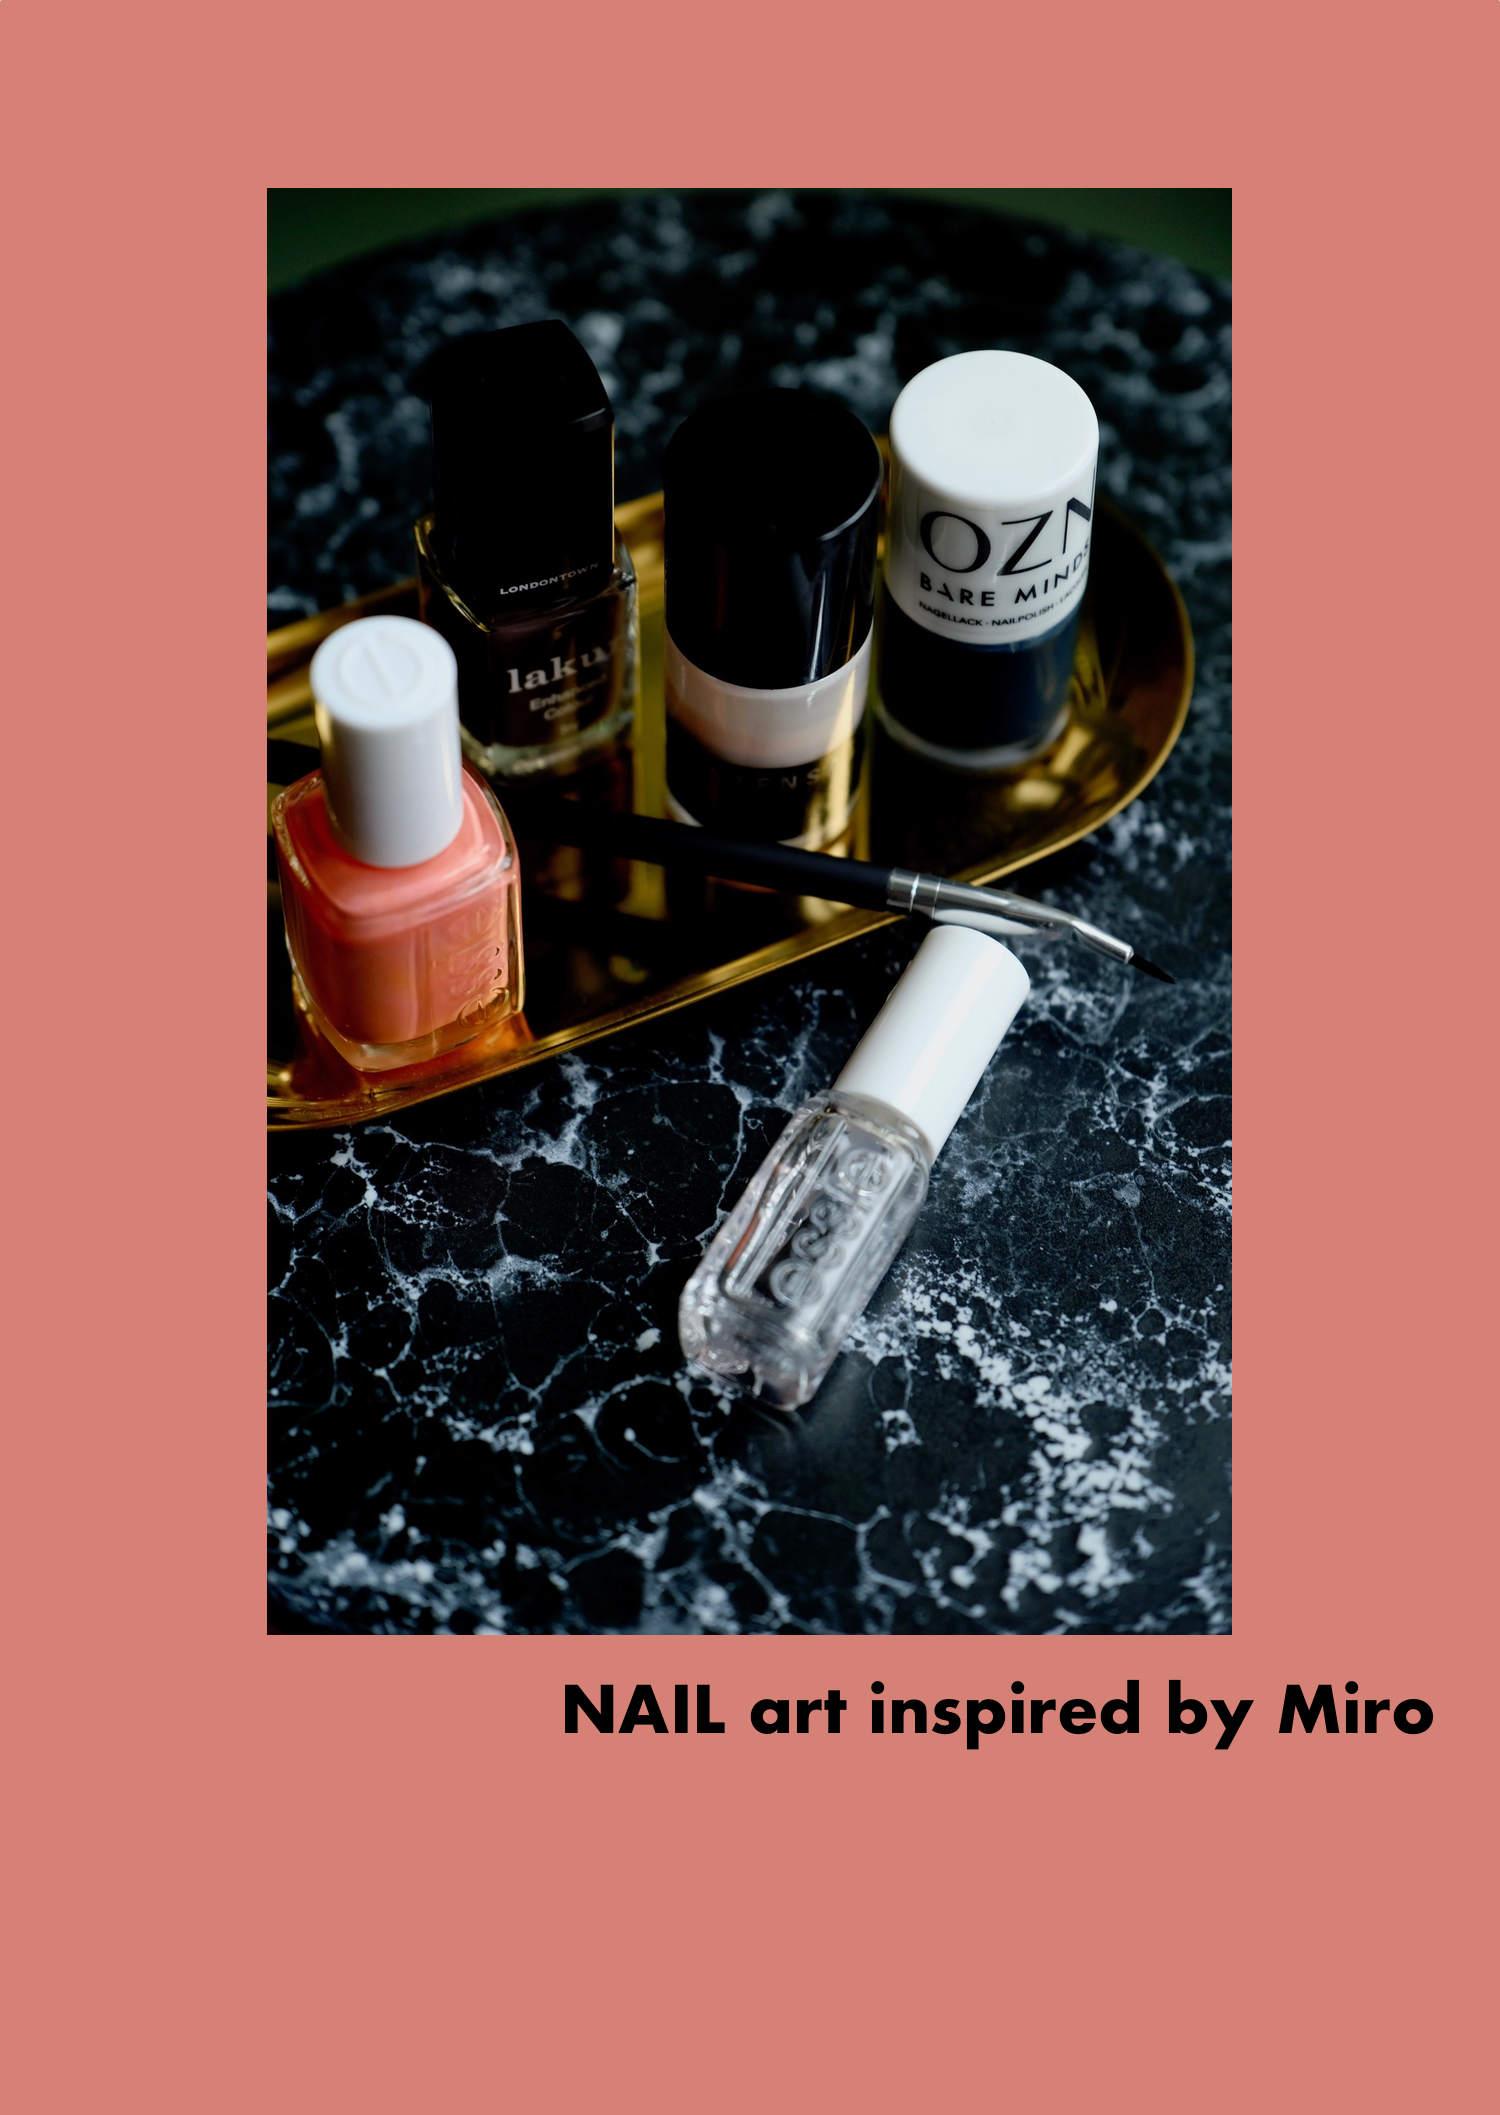 Beautyblog Beautyblogger BARE MINDS Elina Neumann arty Nailart Miro 6